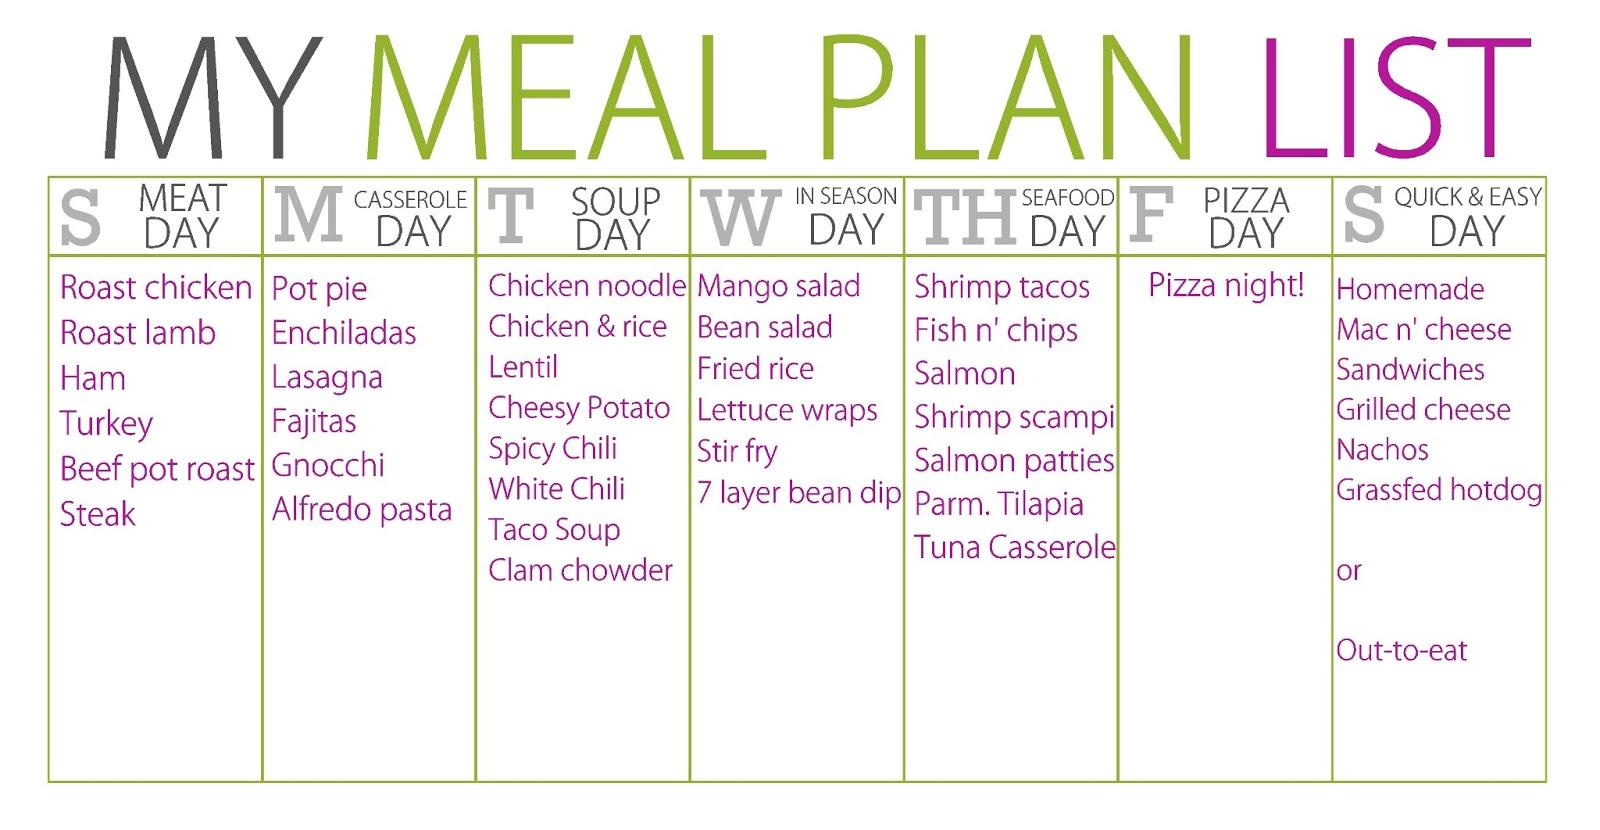 Diet Plan Breakfast Lunch And Dinner